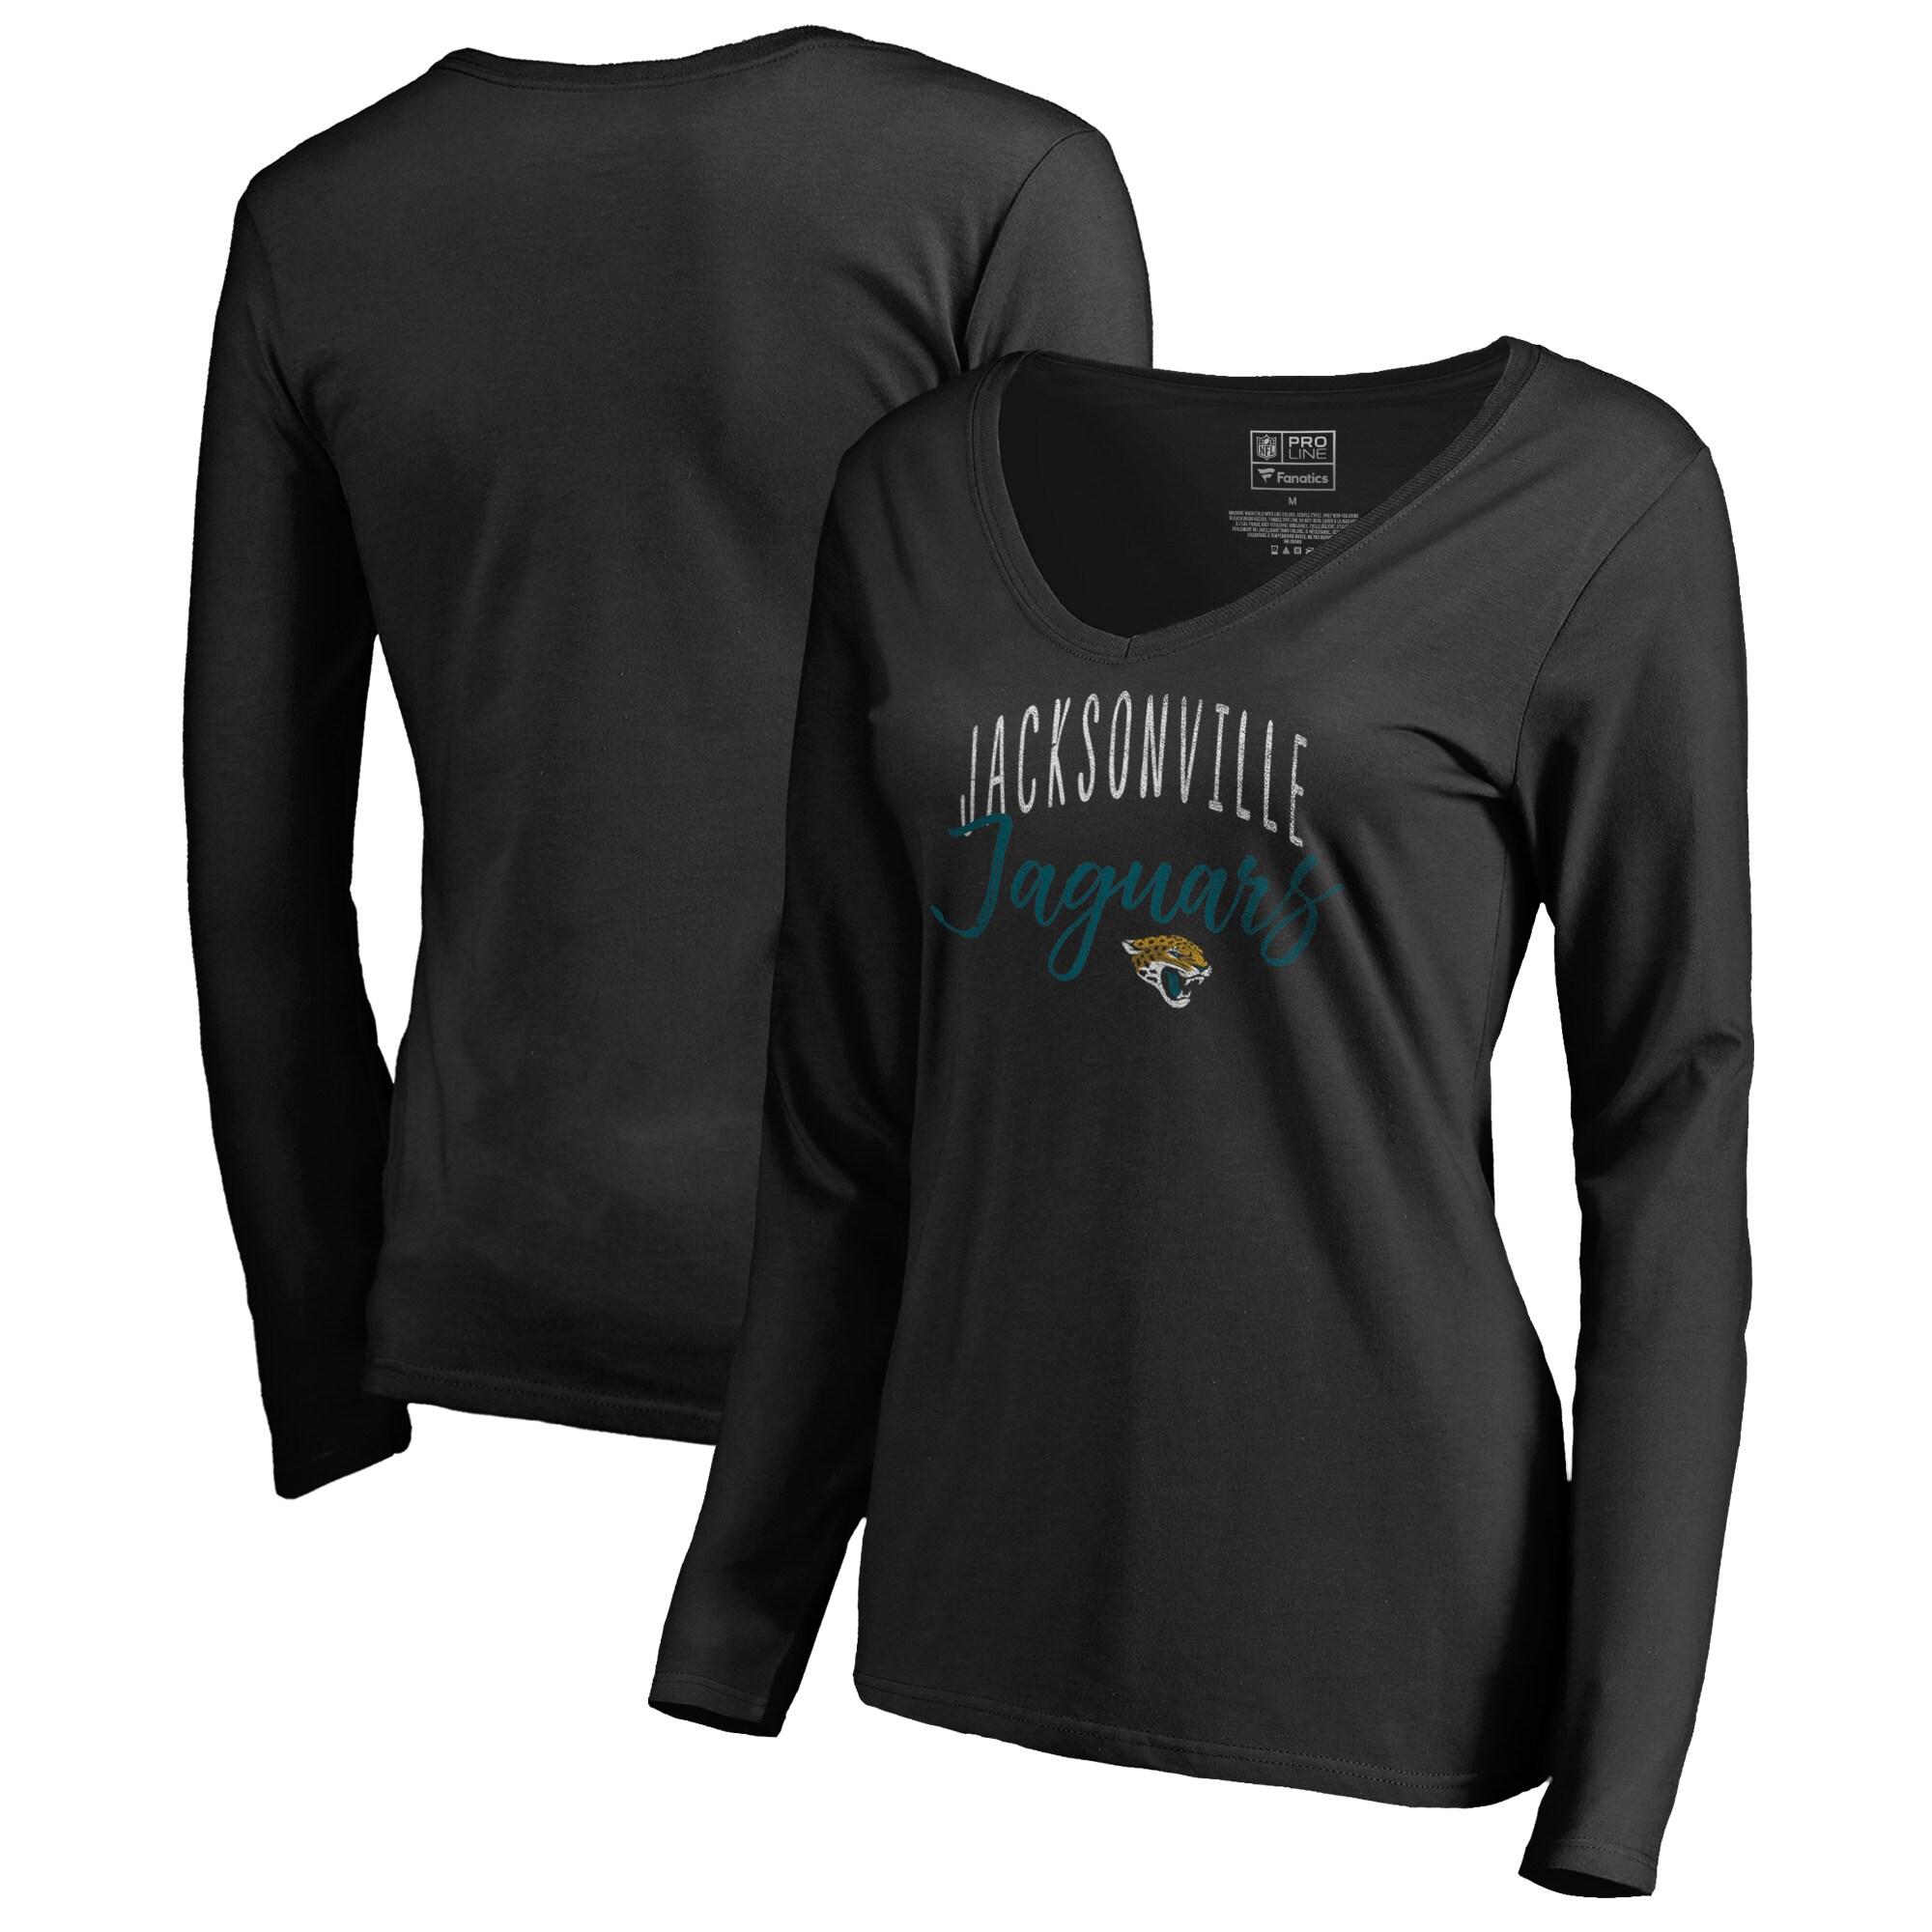 Jacksonville Jaguars NFL Pro Line by Fanatics Branded Women's Graceful Long Sleeve V-Neck T-Shirt - Black